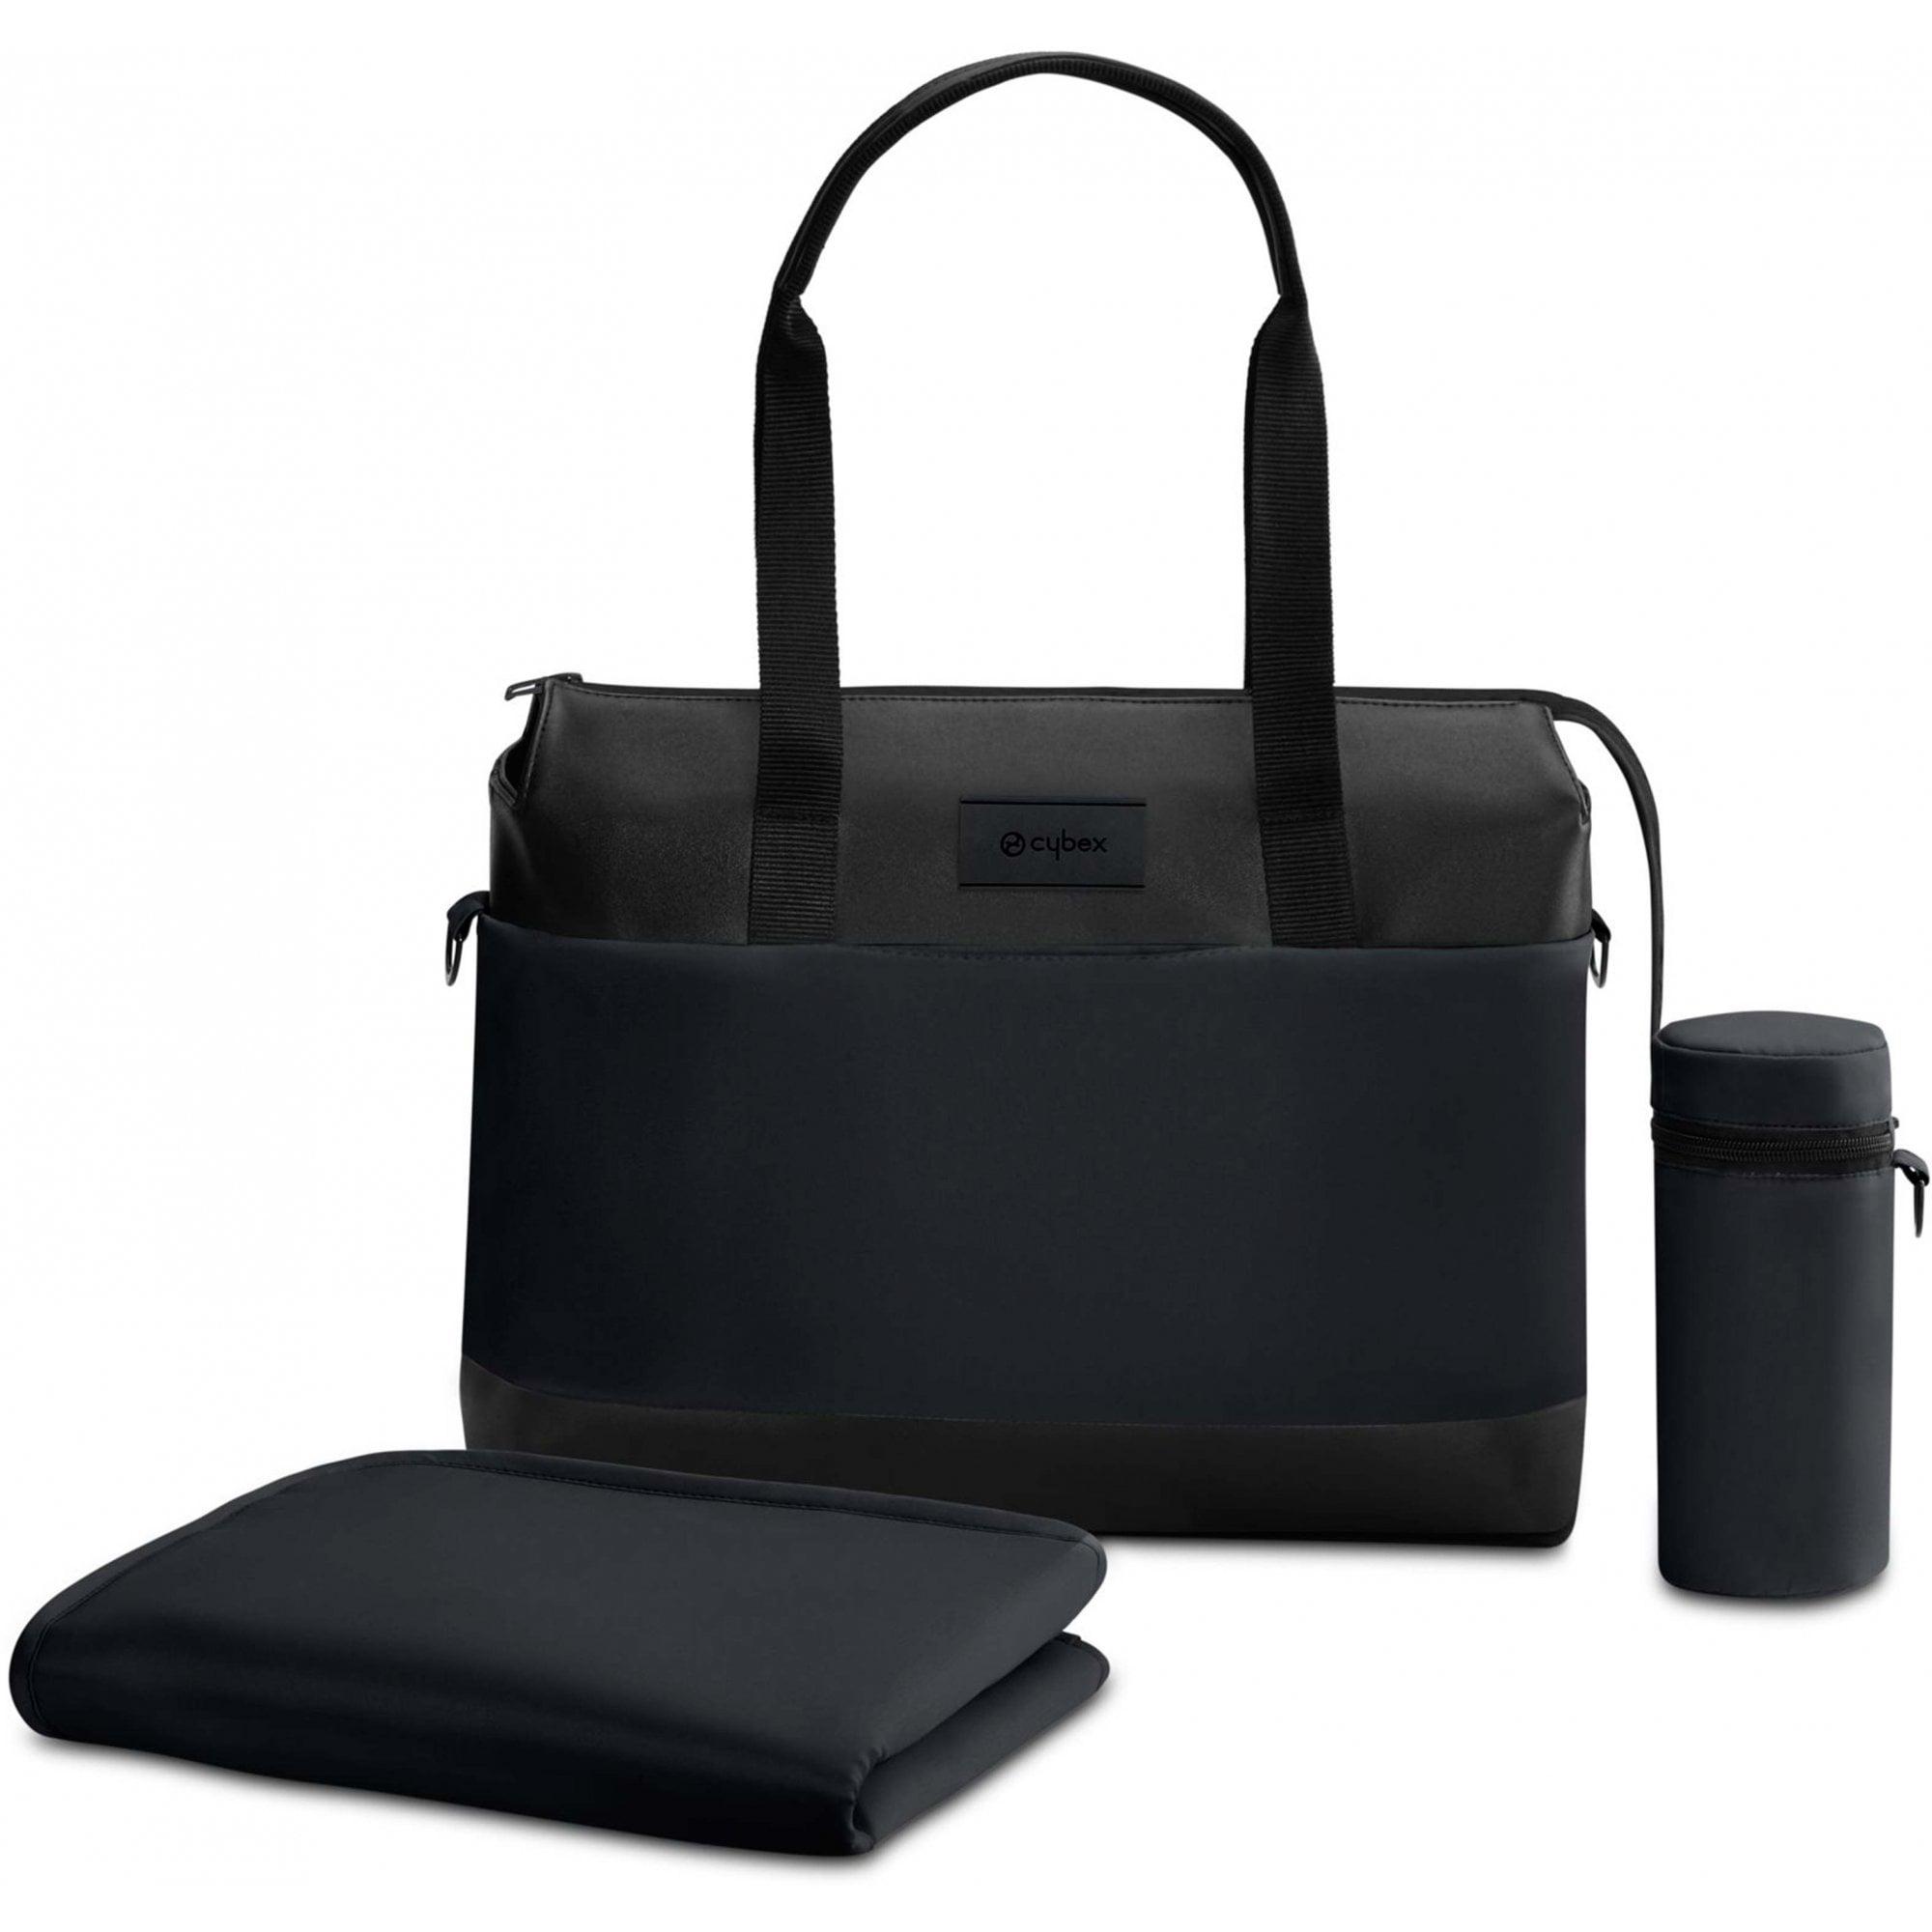 Fashionable changing bag Black Black Cybex